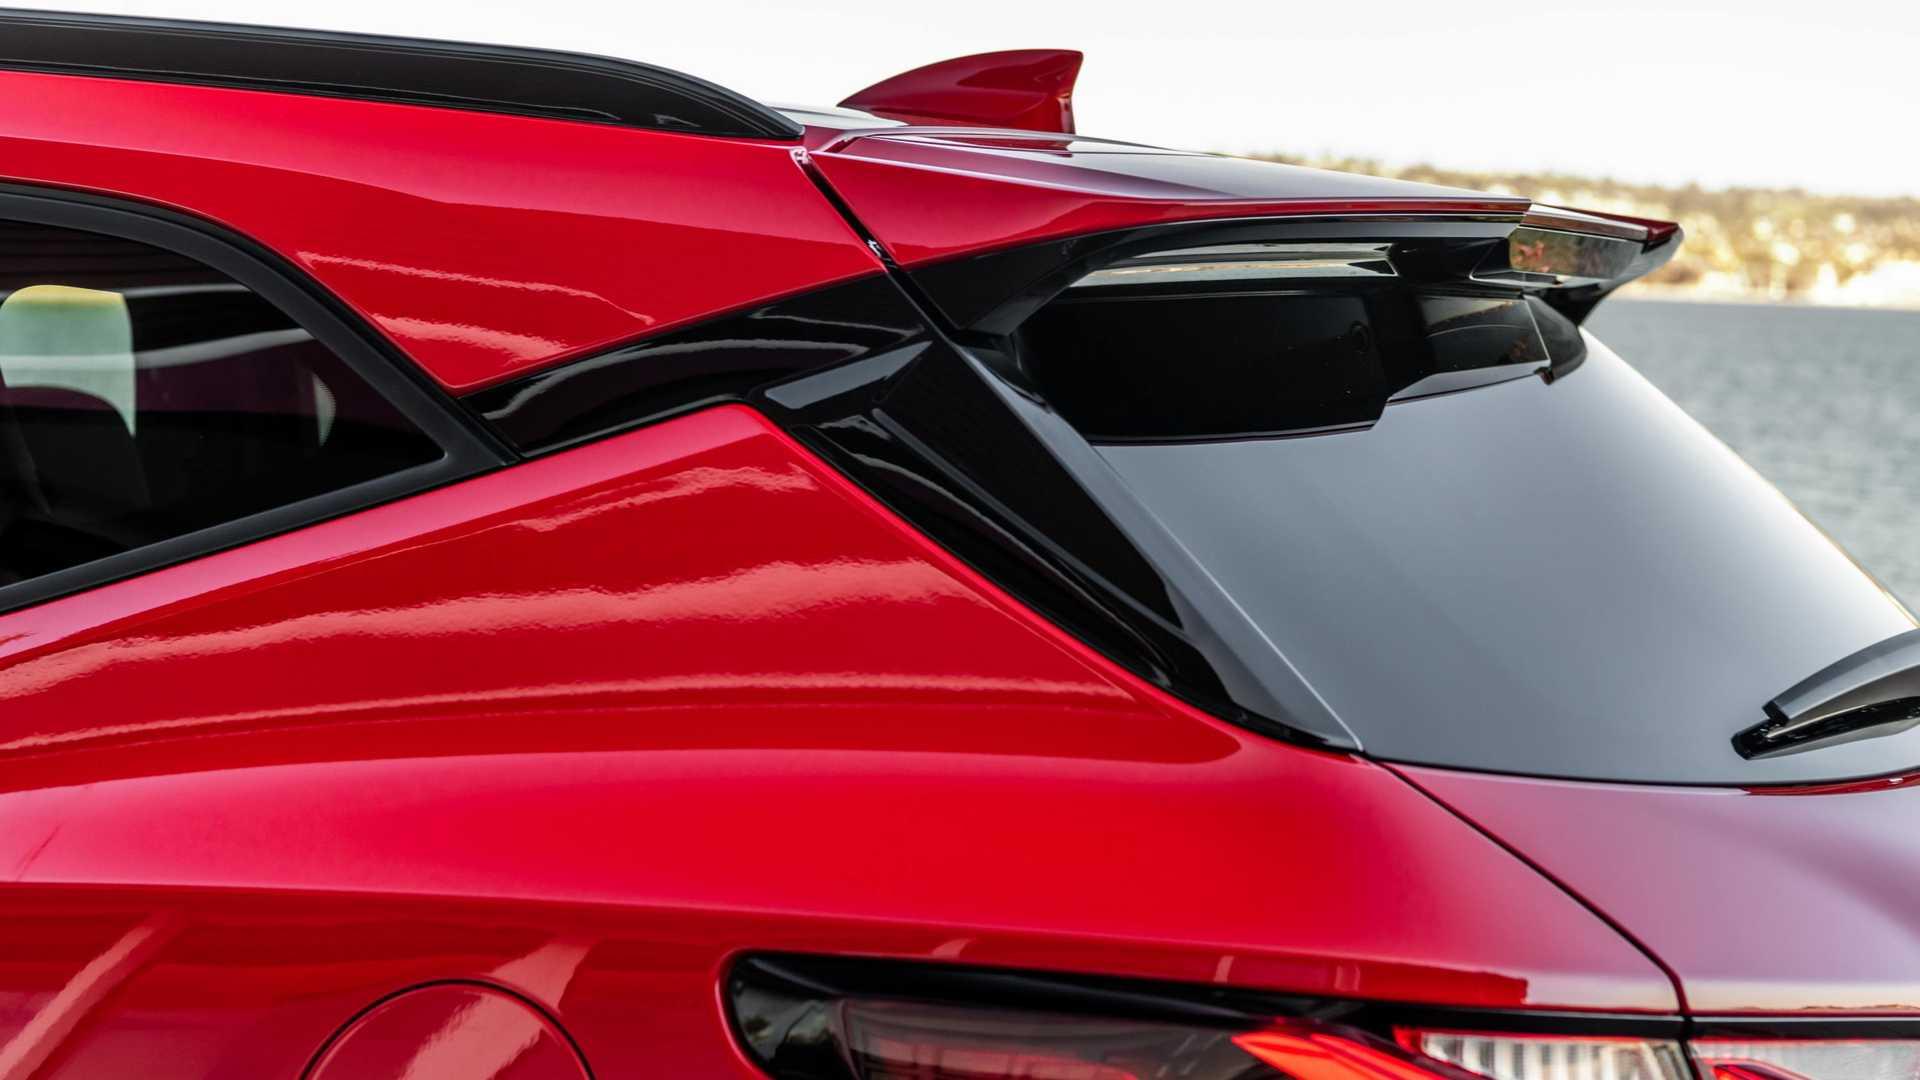 2019-chevrolet-blazer-first-drive-danh-gia-12.jpg